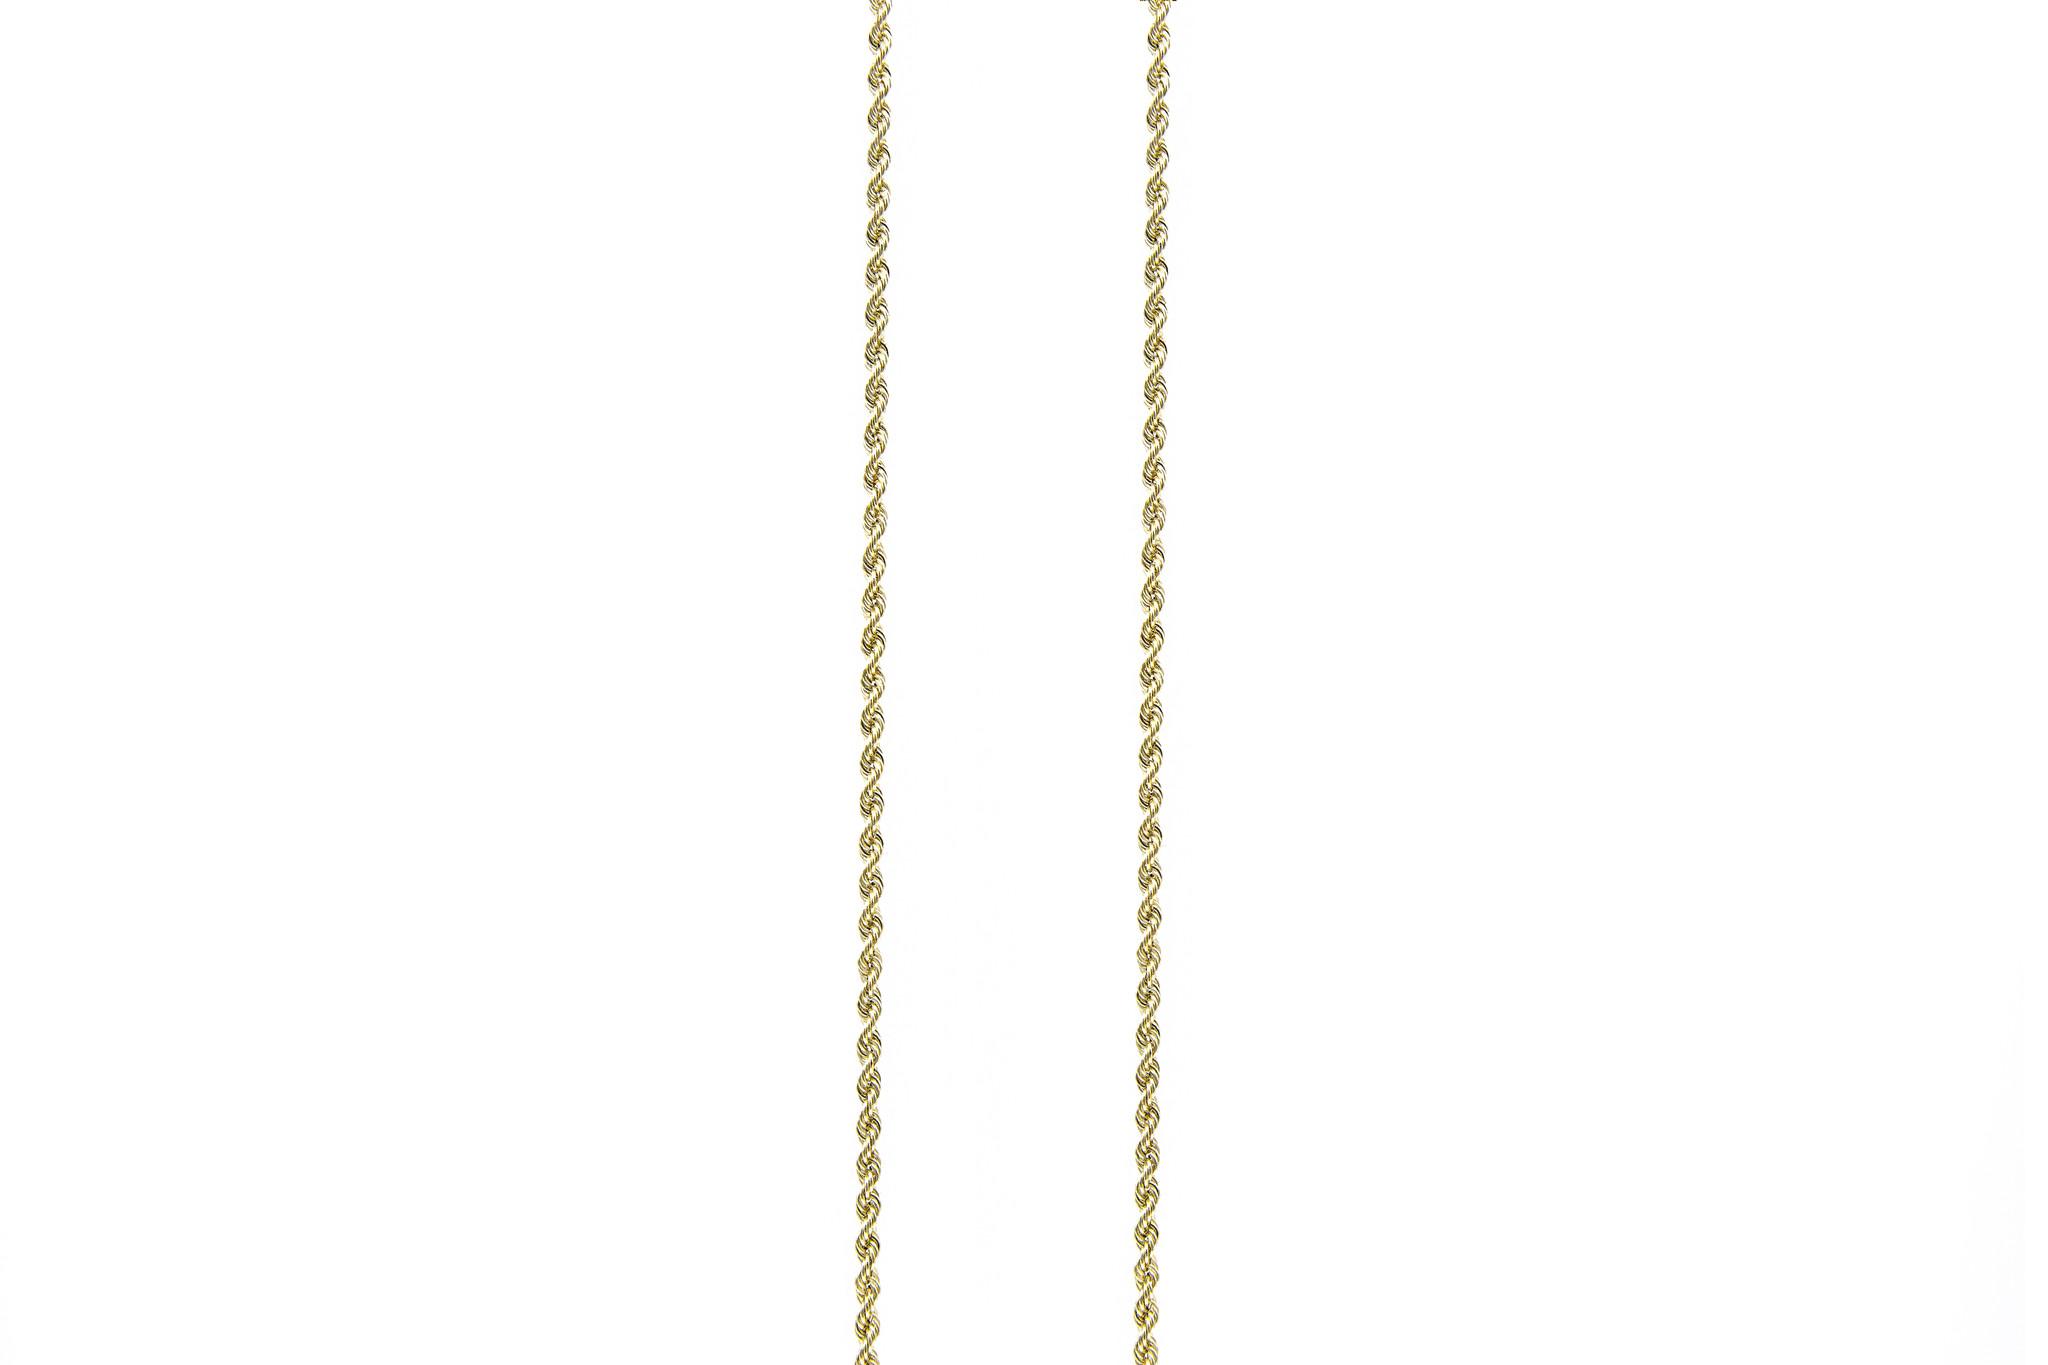 Rope chain ketting massief goud 14 kt 2.5 mm-1